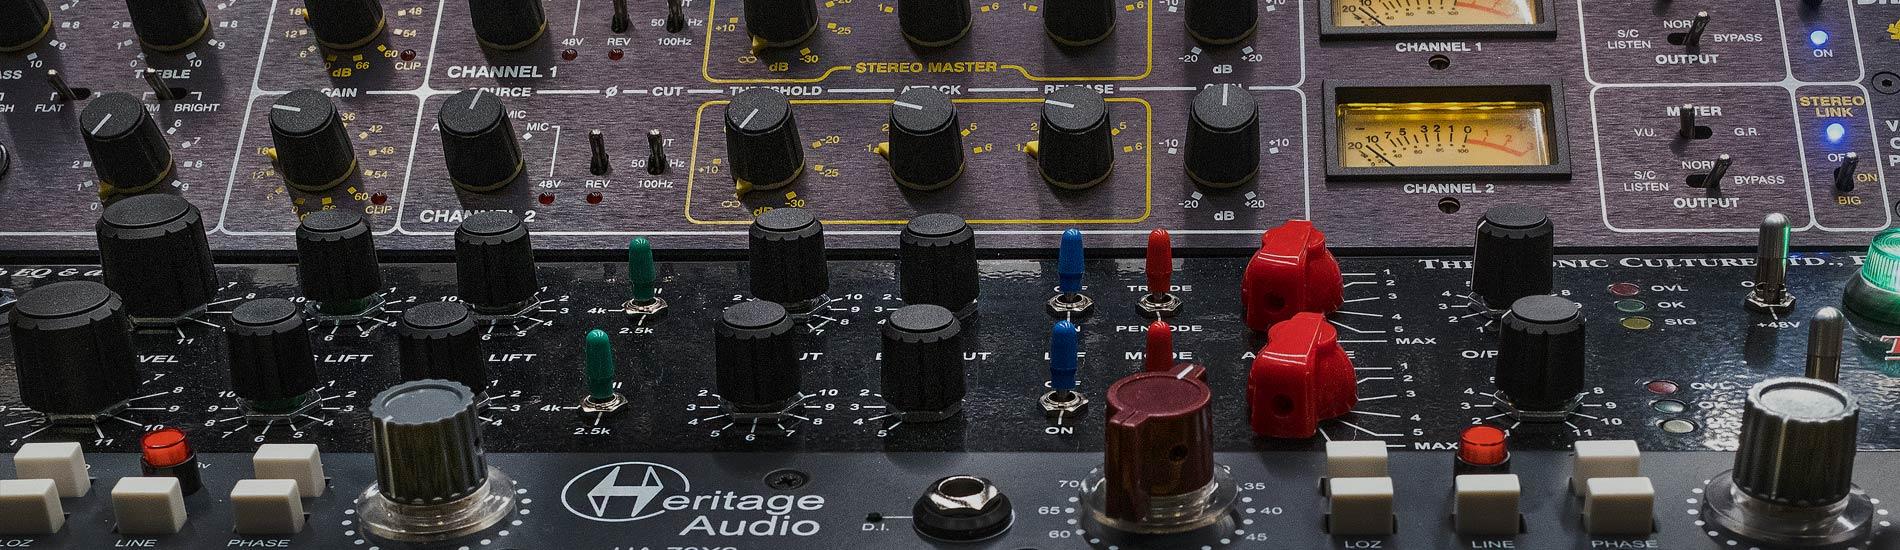 Metrica Recording Studio Ibiza, stereo binaural & 3D sound Mixing Mastering production estudio de grabación Ibiza sonido masterización producción musical